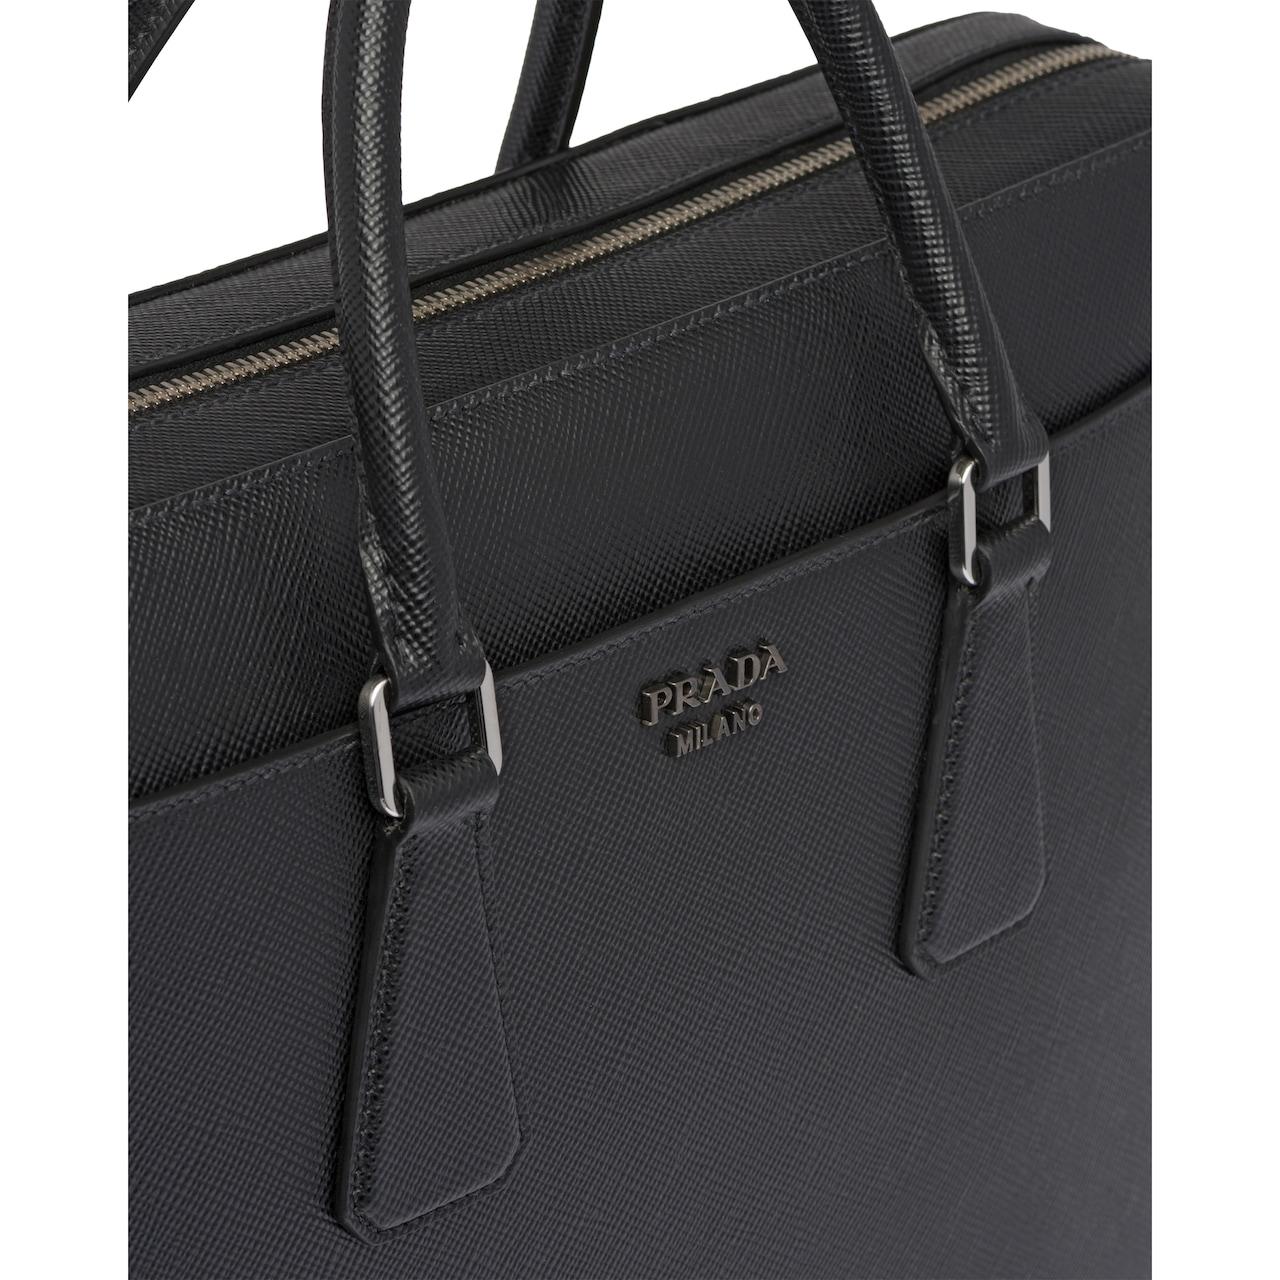 Prada Saffiano Cuir leather briefcase 5